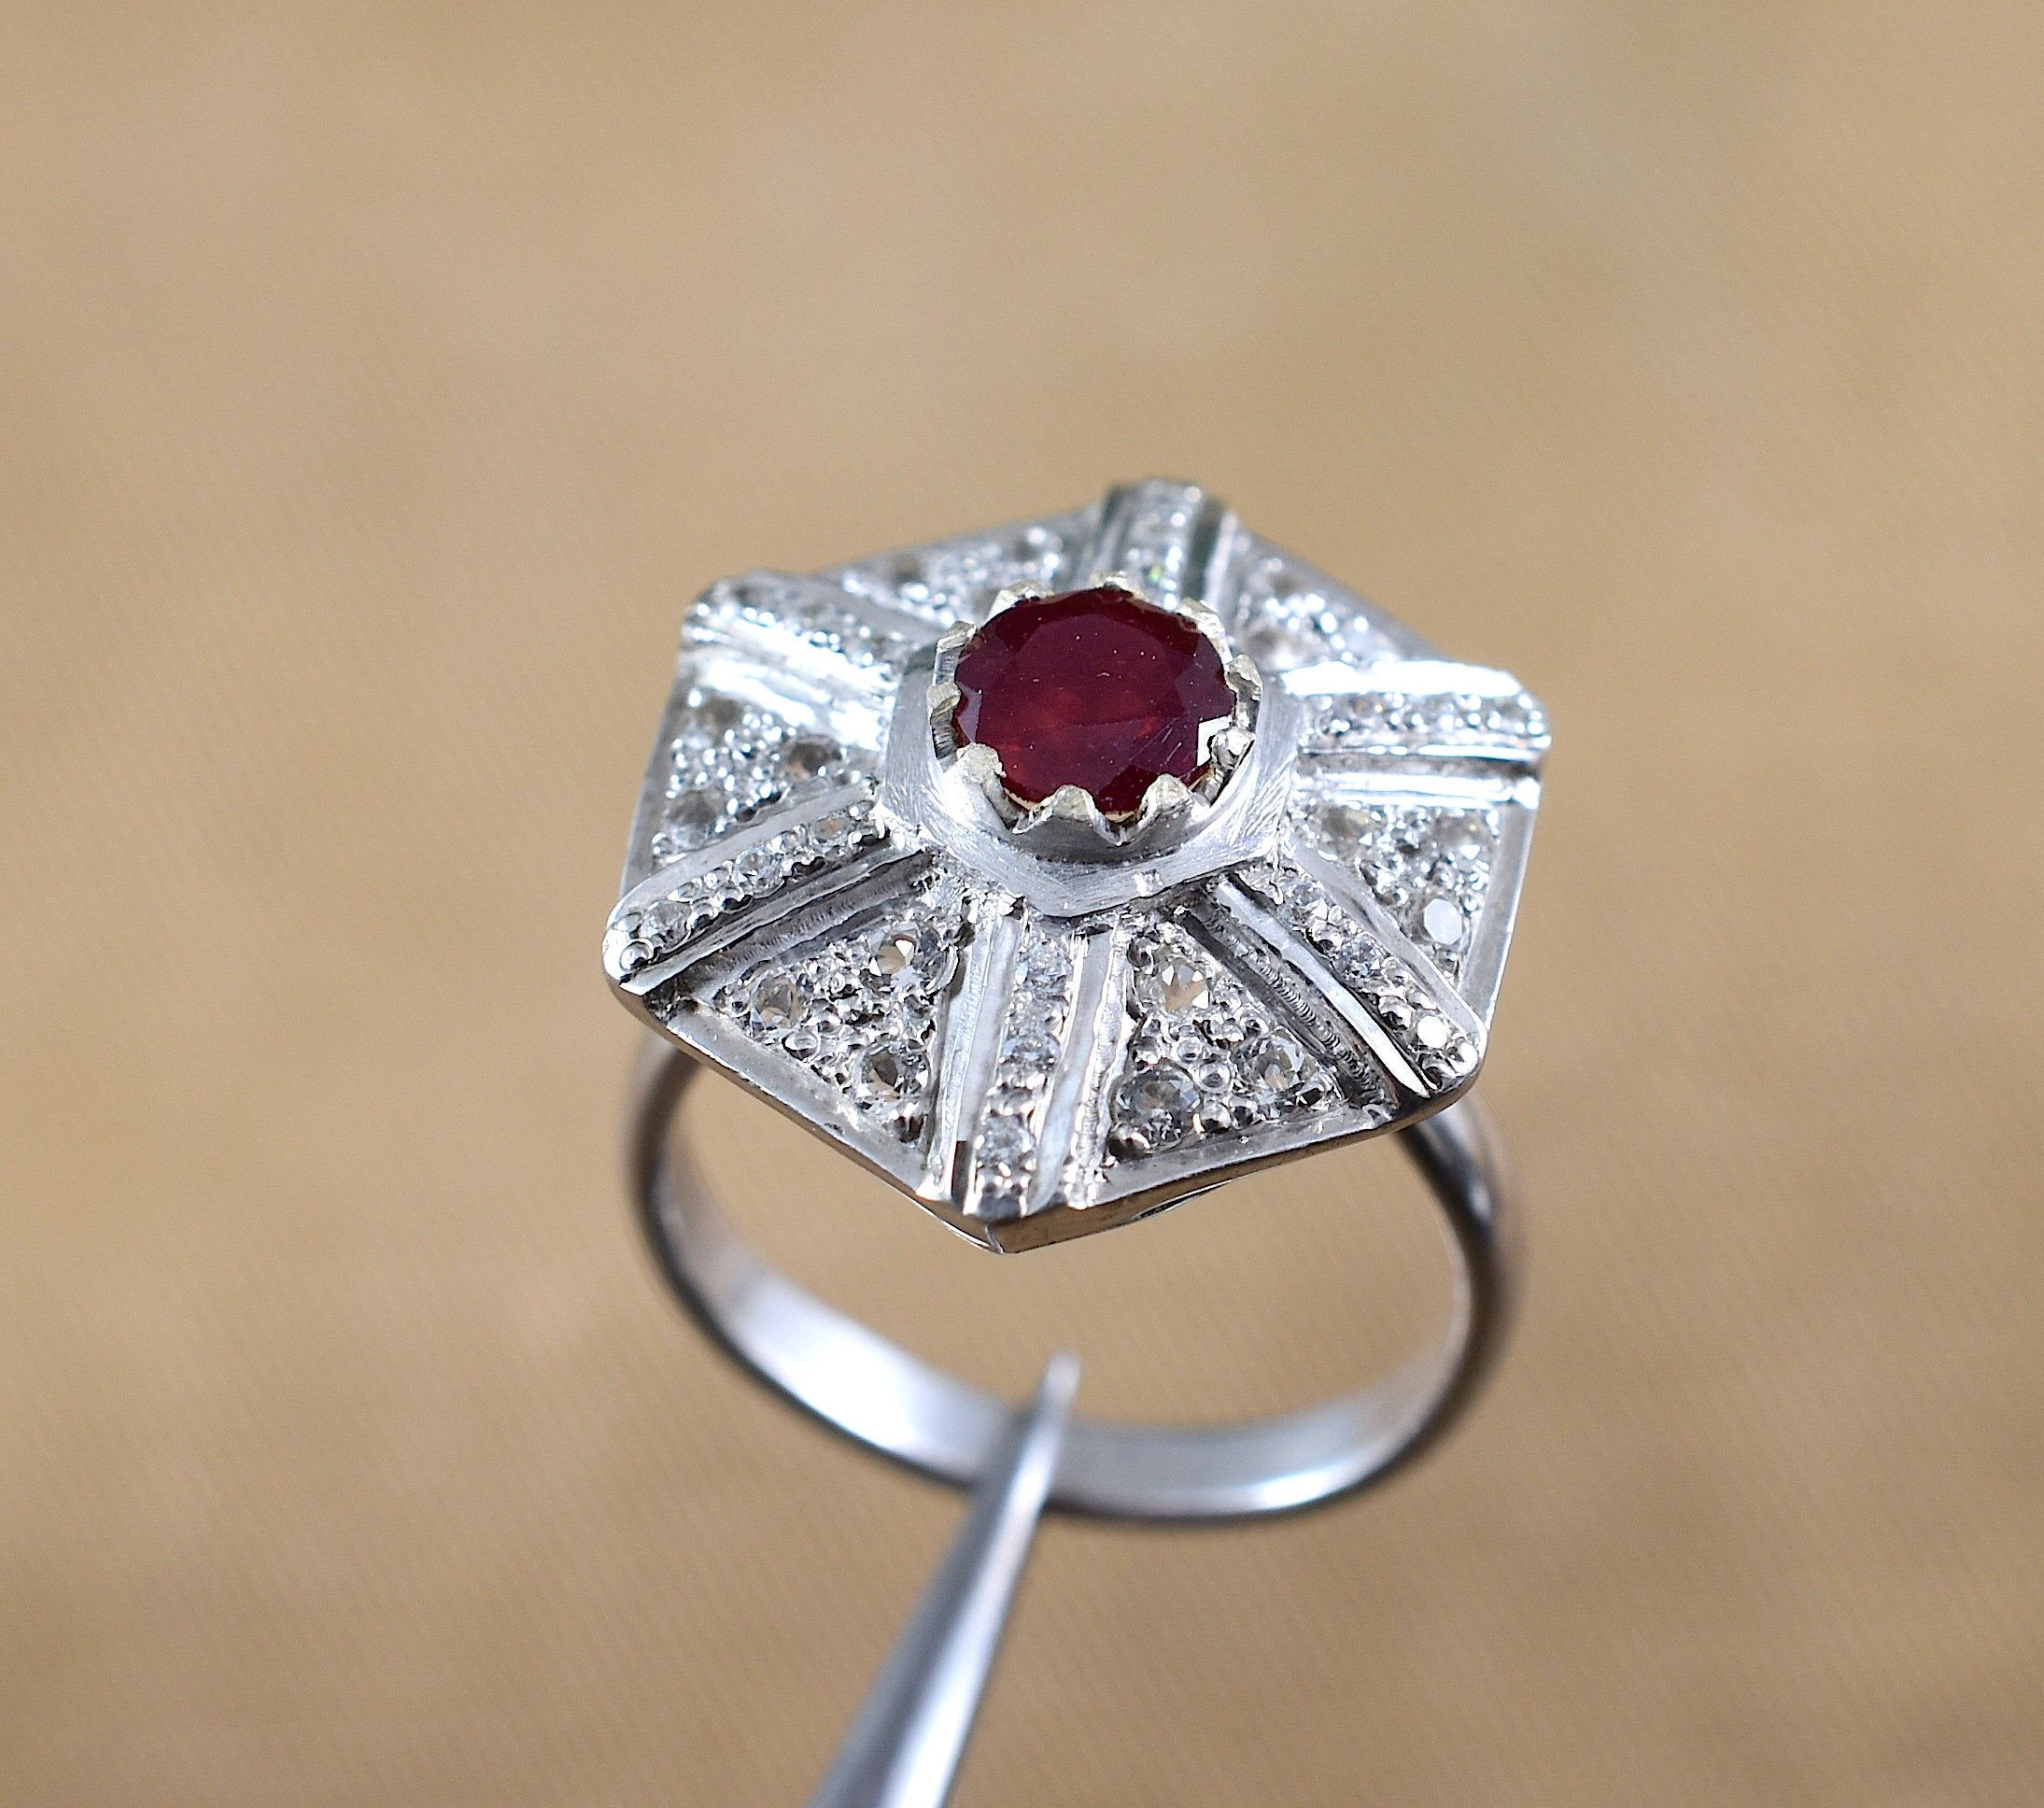 Ruby Silver Ring RUBY RING Gemstone Ring Christmas Gift,Statement Ring Engagement Ring,Birthday Gift,Wedding Ring.Design N0- RRGF-017